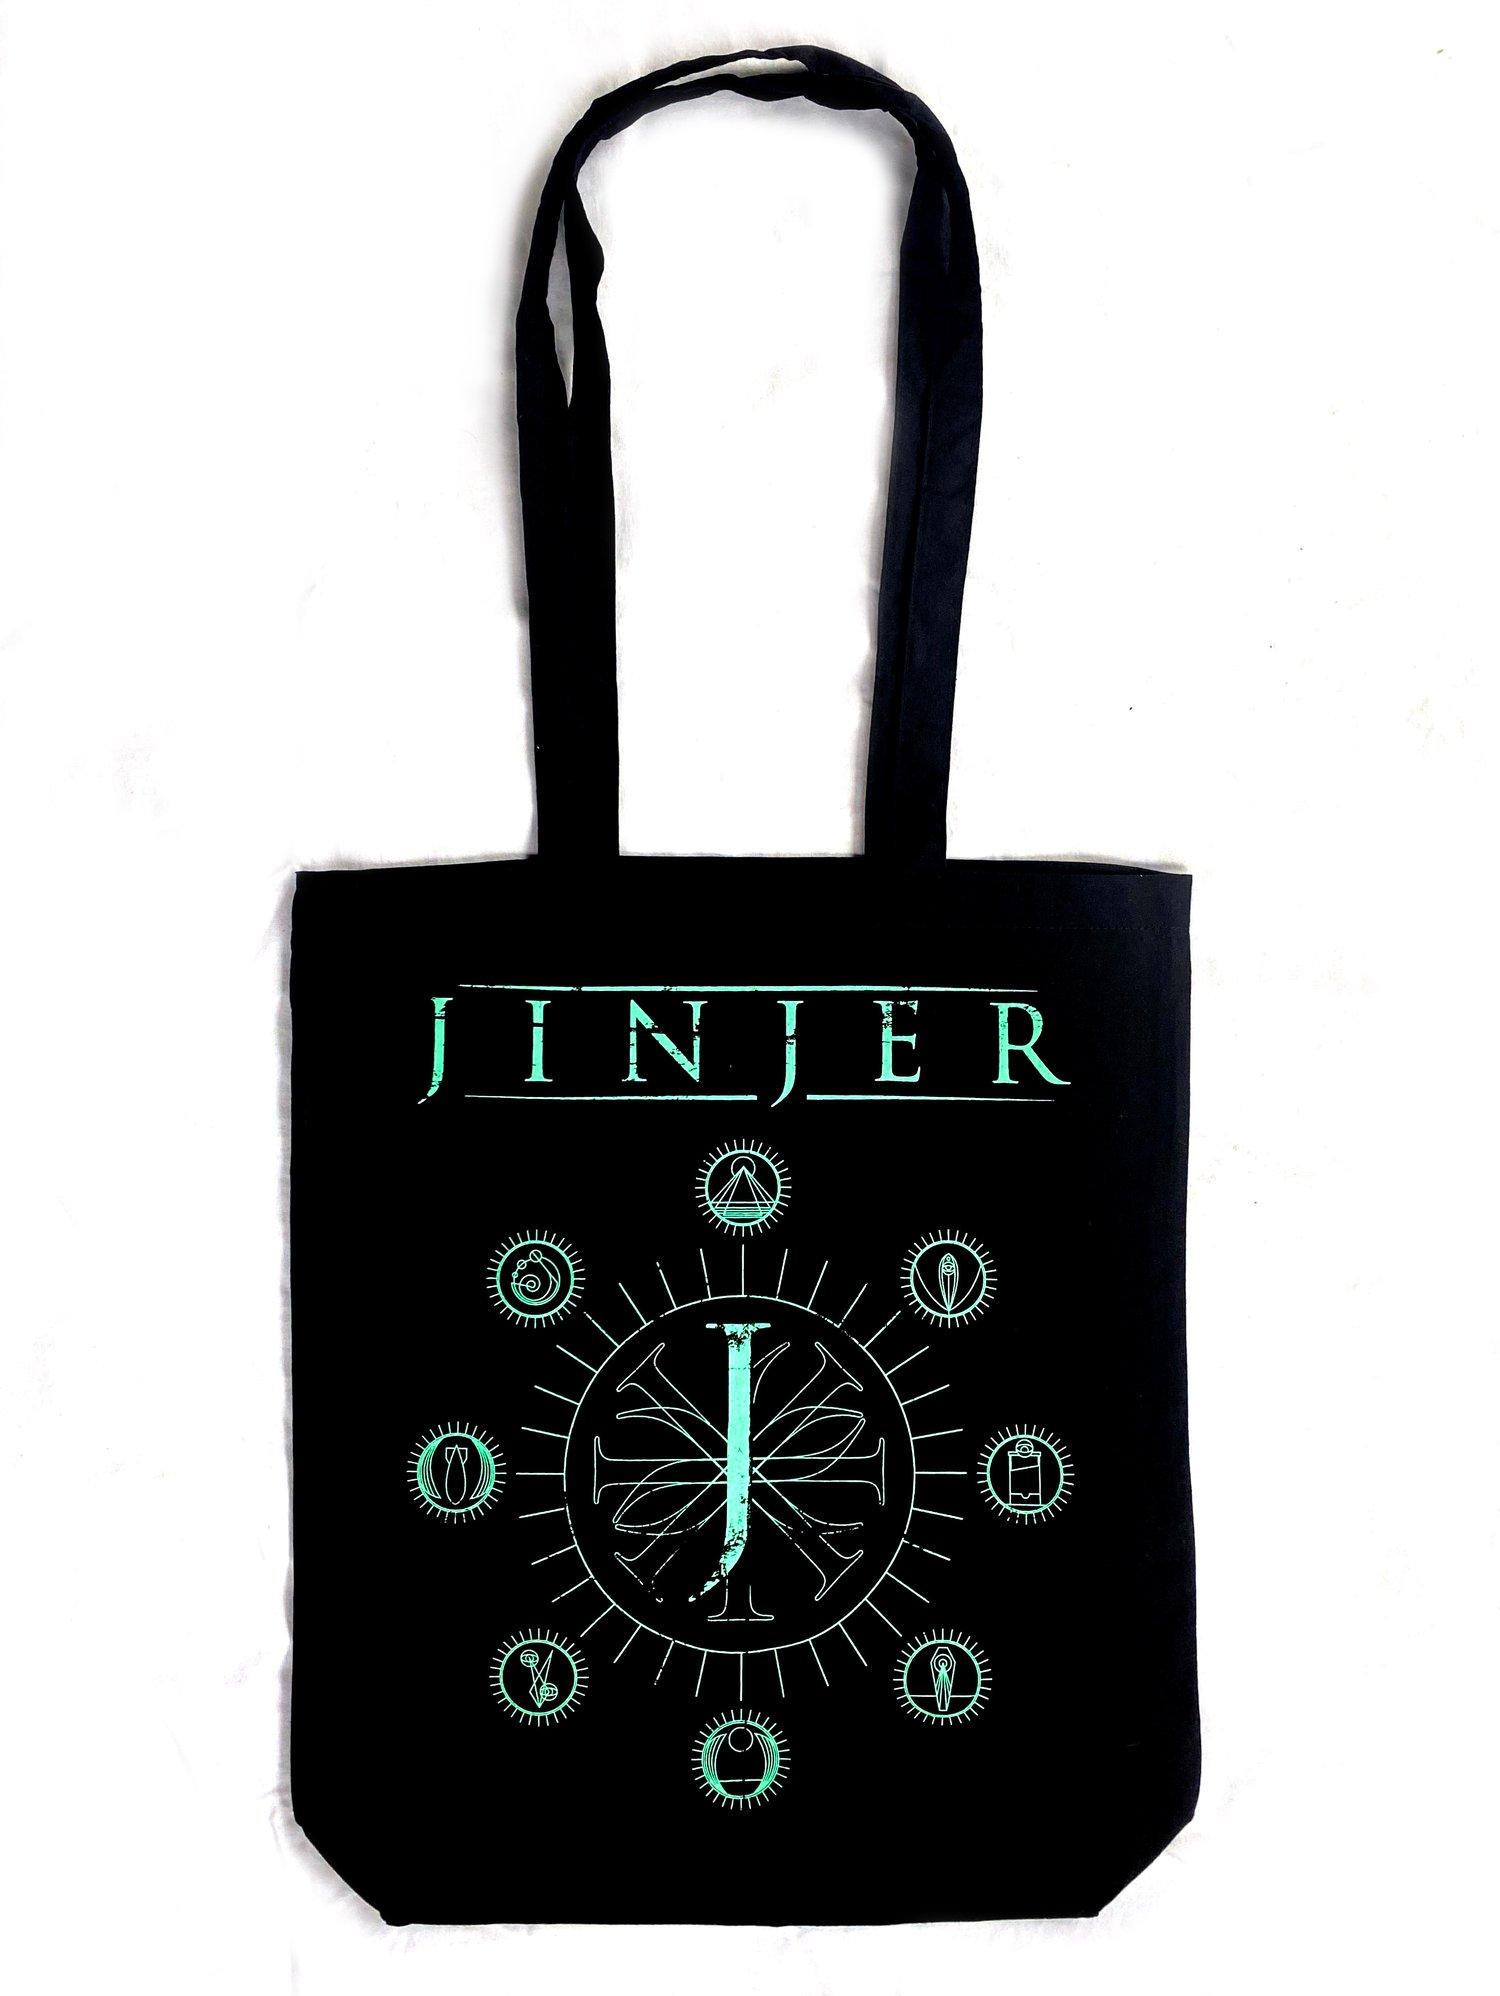 Image of Jinjer Tote Bag - 'Jeometry' design - 100% Cotton